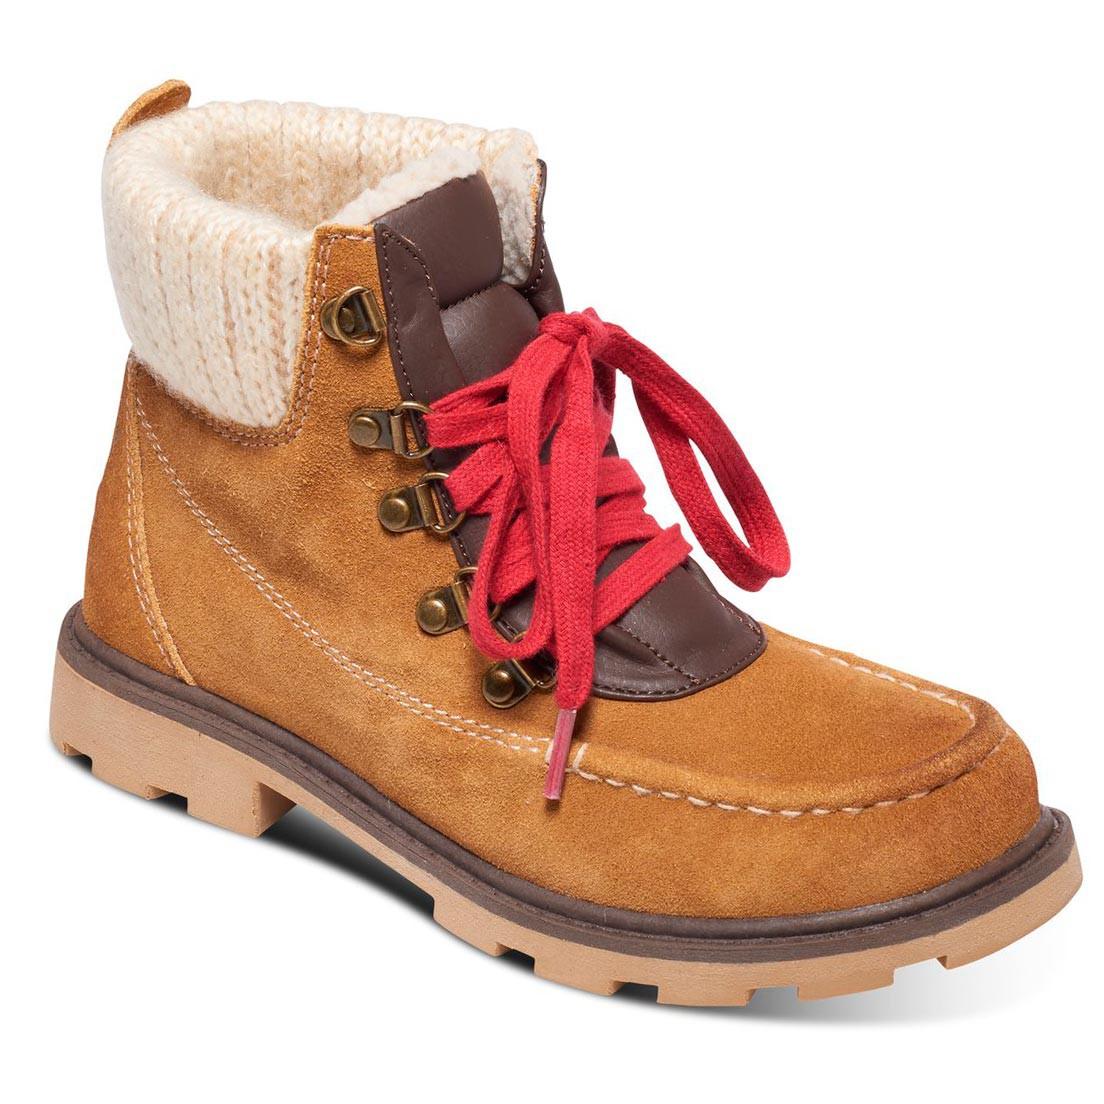 Zimní boty Roxy Creston tan